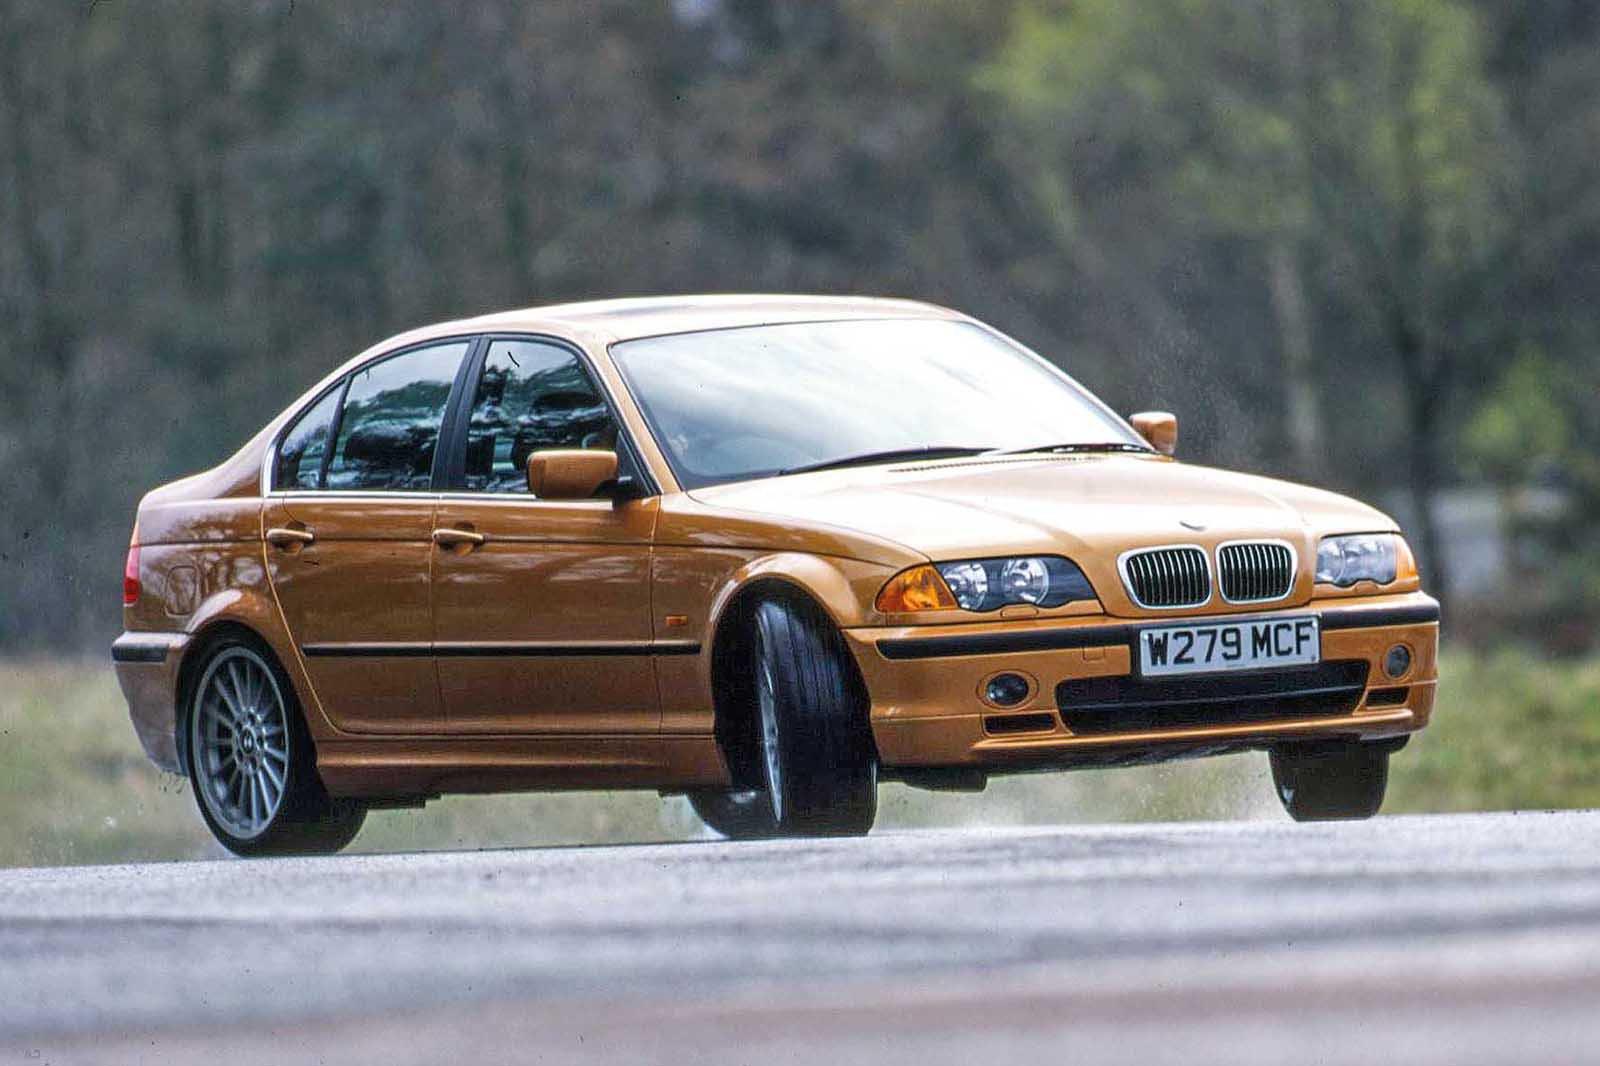 BMW 330i front three quarters